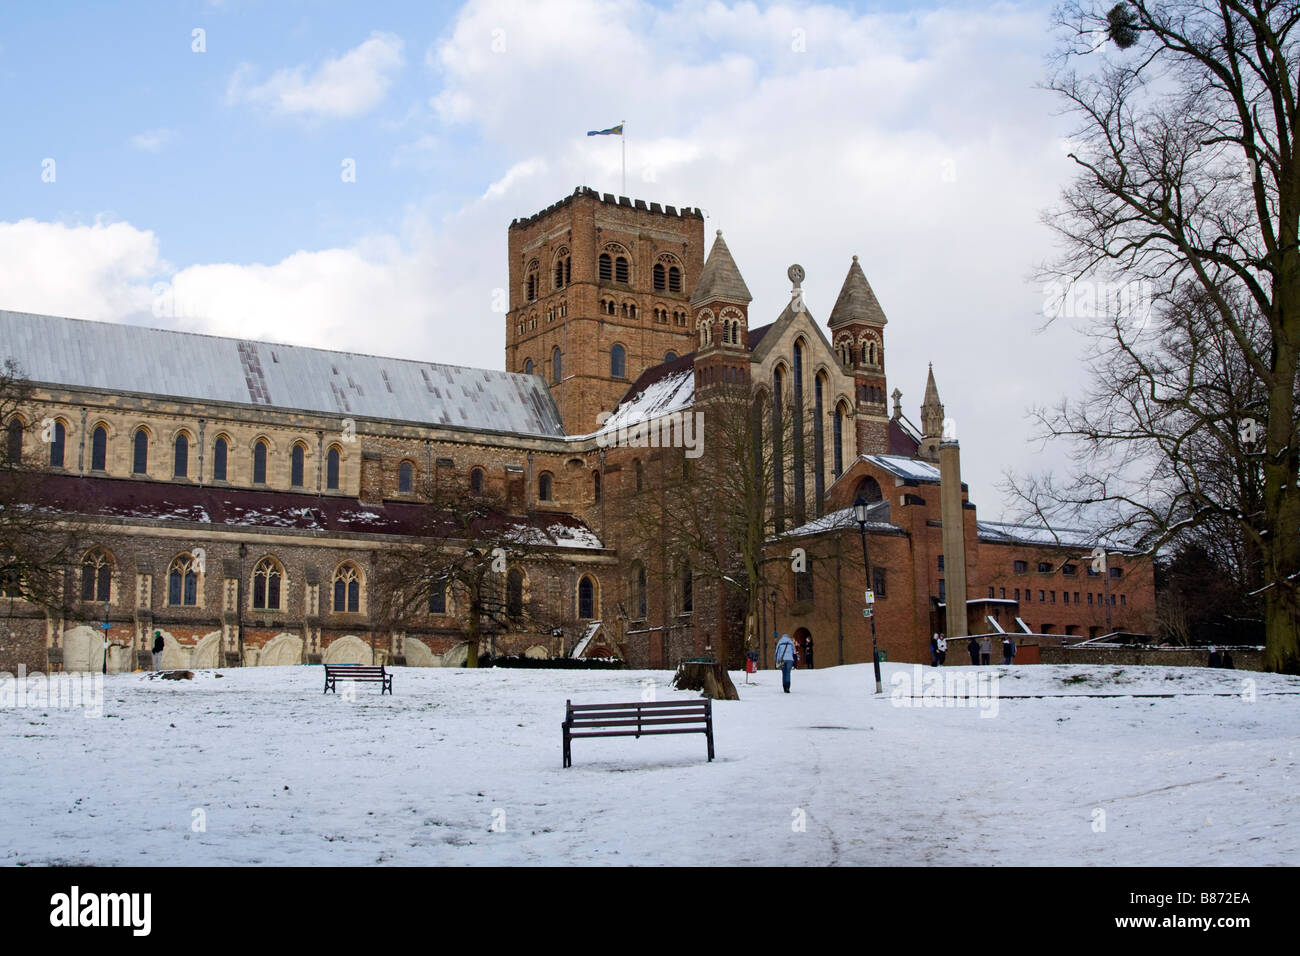 St Albans Abbey Hertfordshire Winter - Stock Image